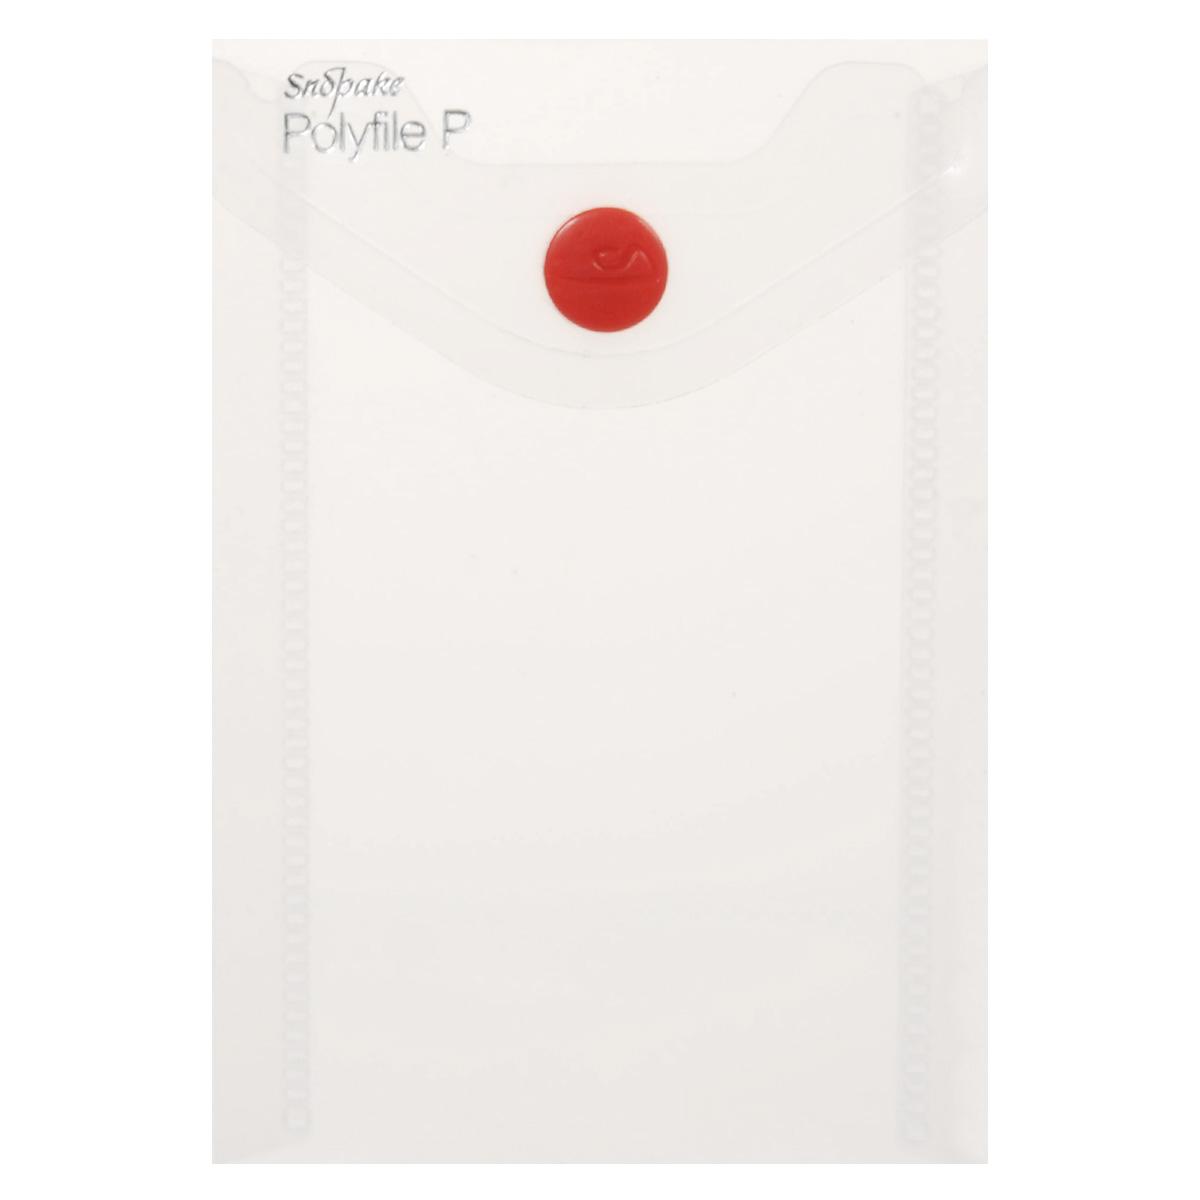 Папка-конверт на кнопке Snopake Polyfile P, вертикальная, цвет: прозрачный. Формат А7K13306